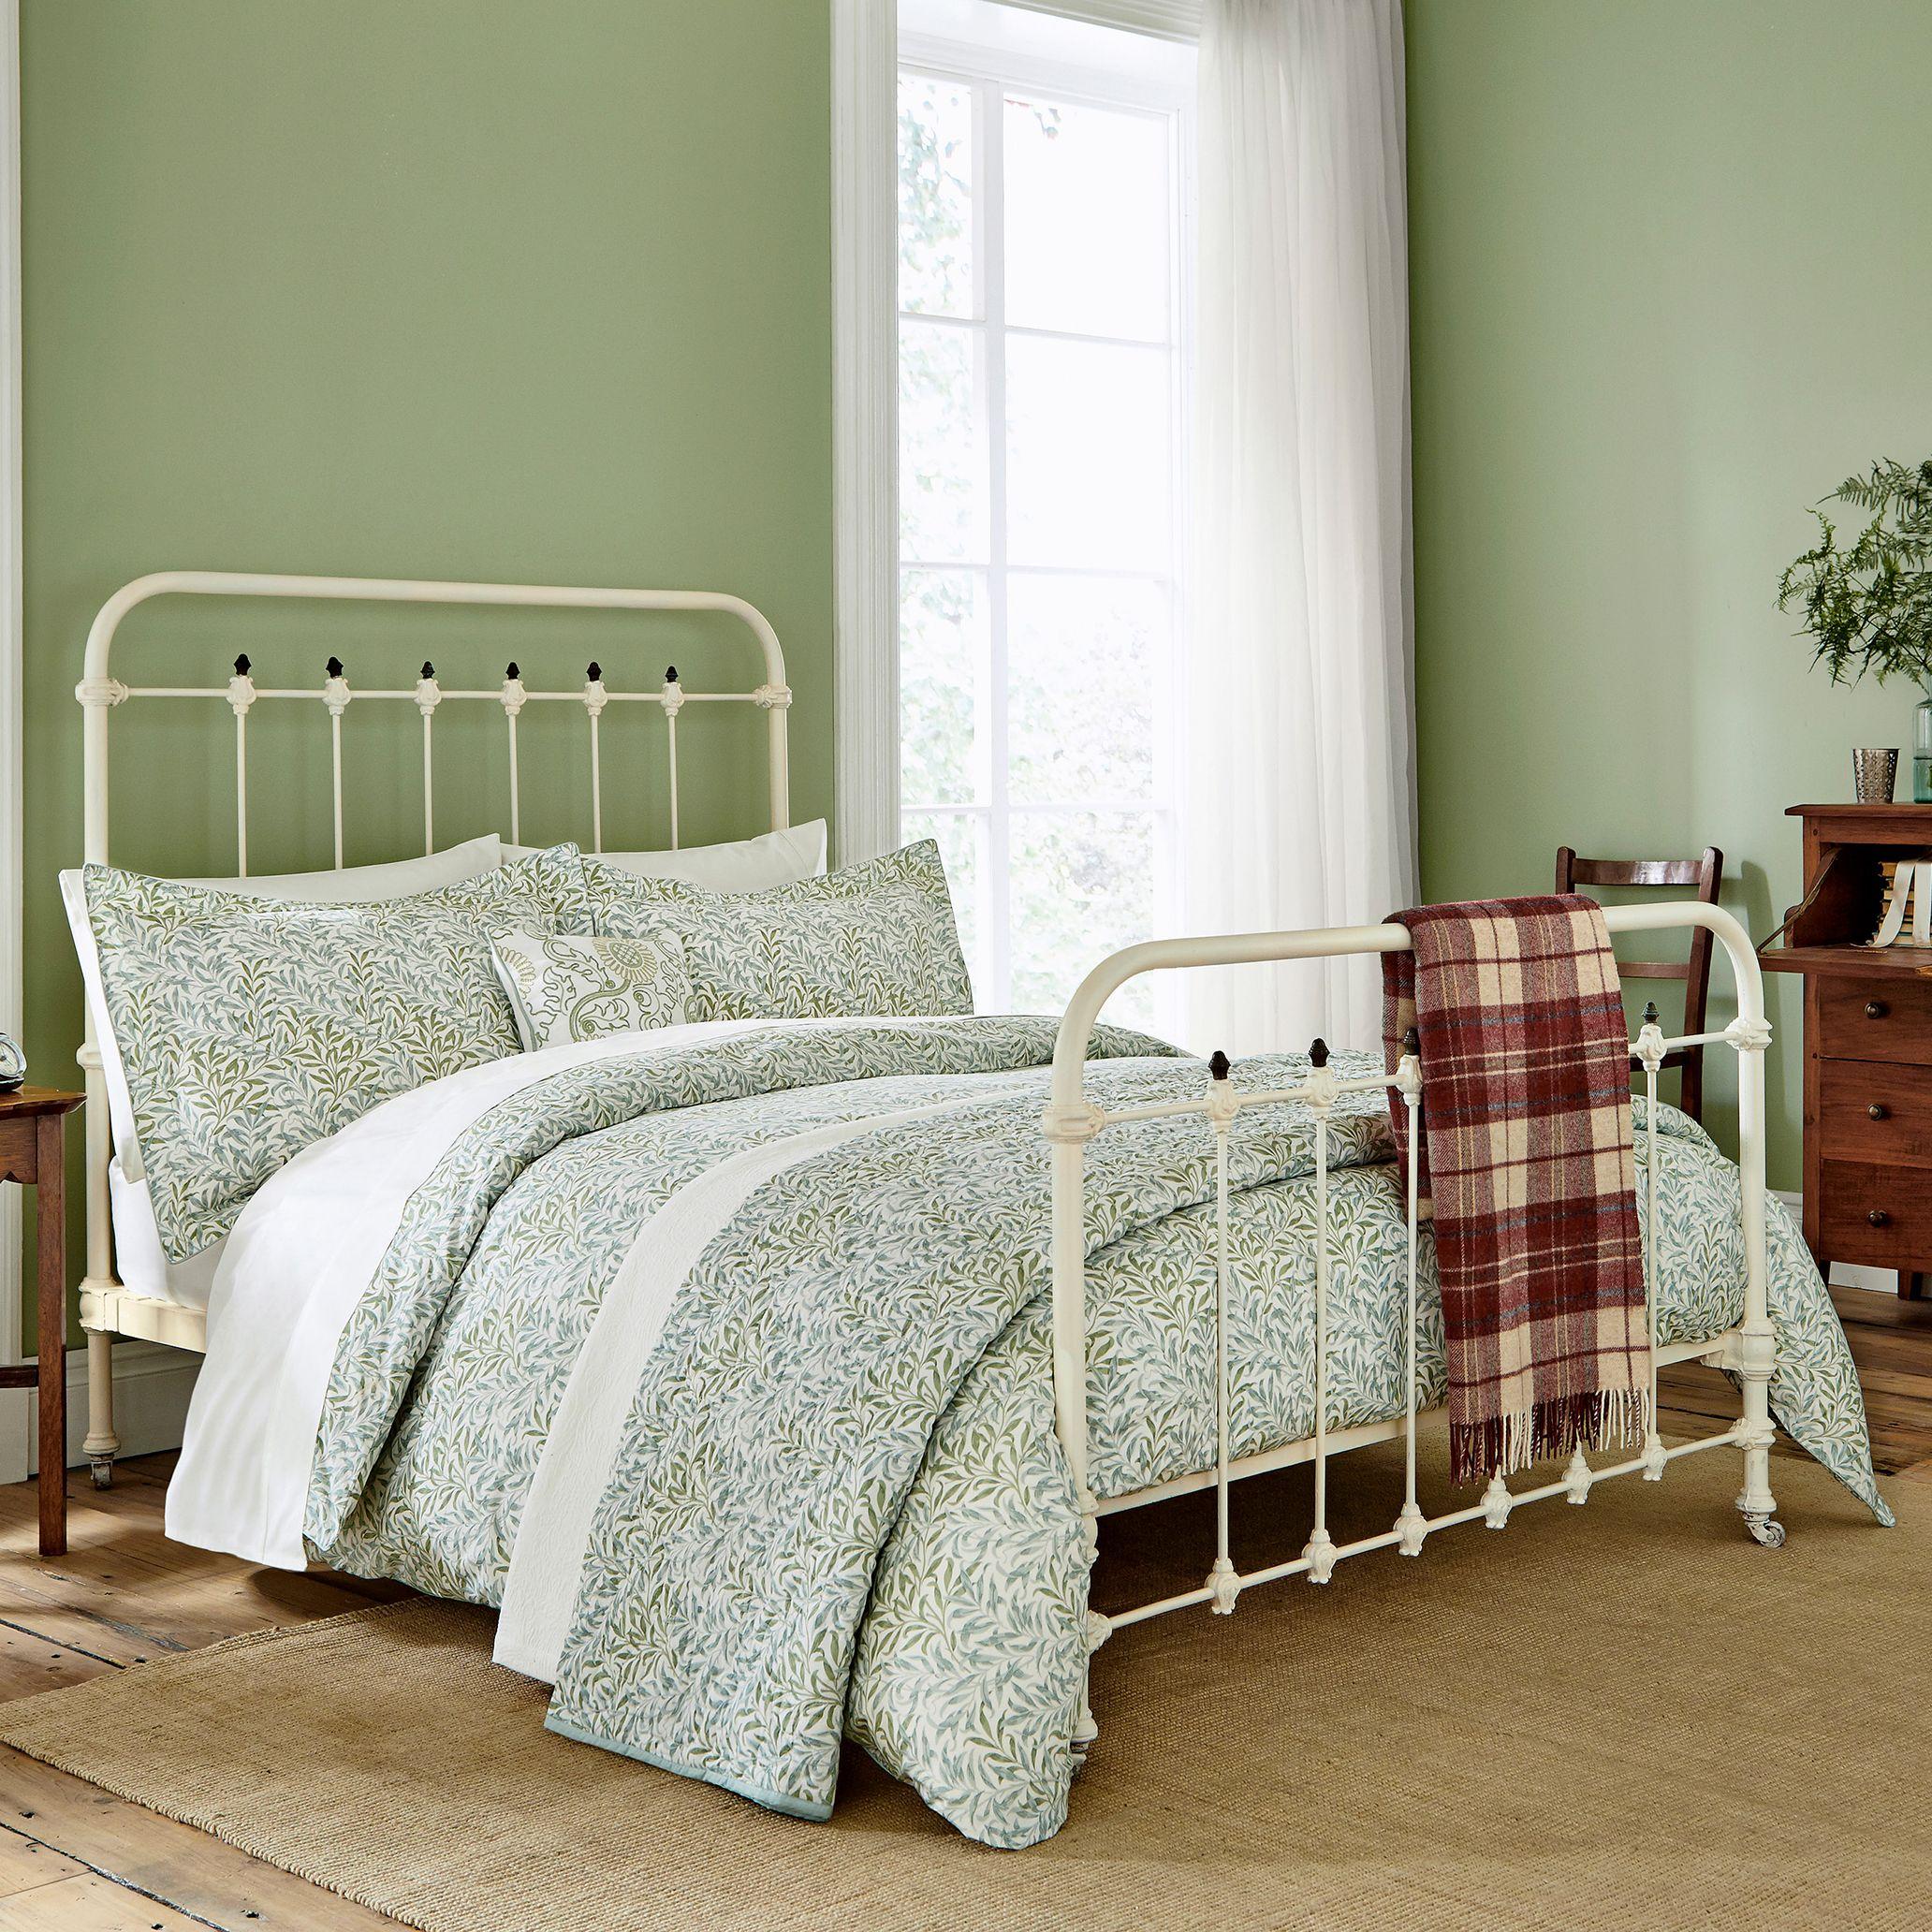 Morris & Co Morris & Co Willow Bough Duvet Cover and Pillowcase Set